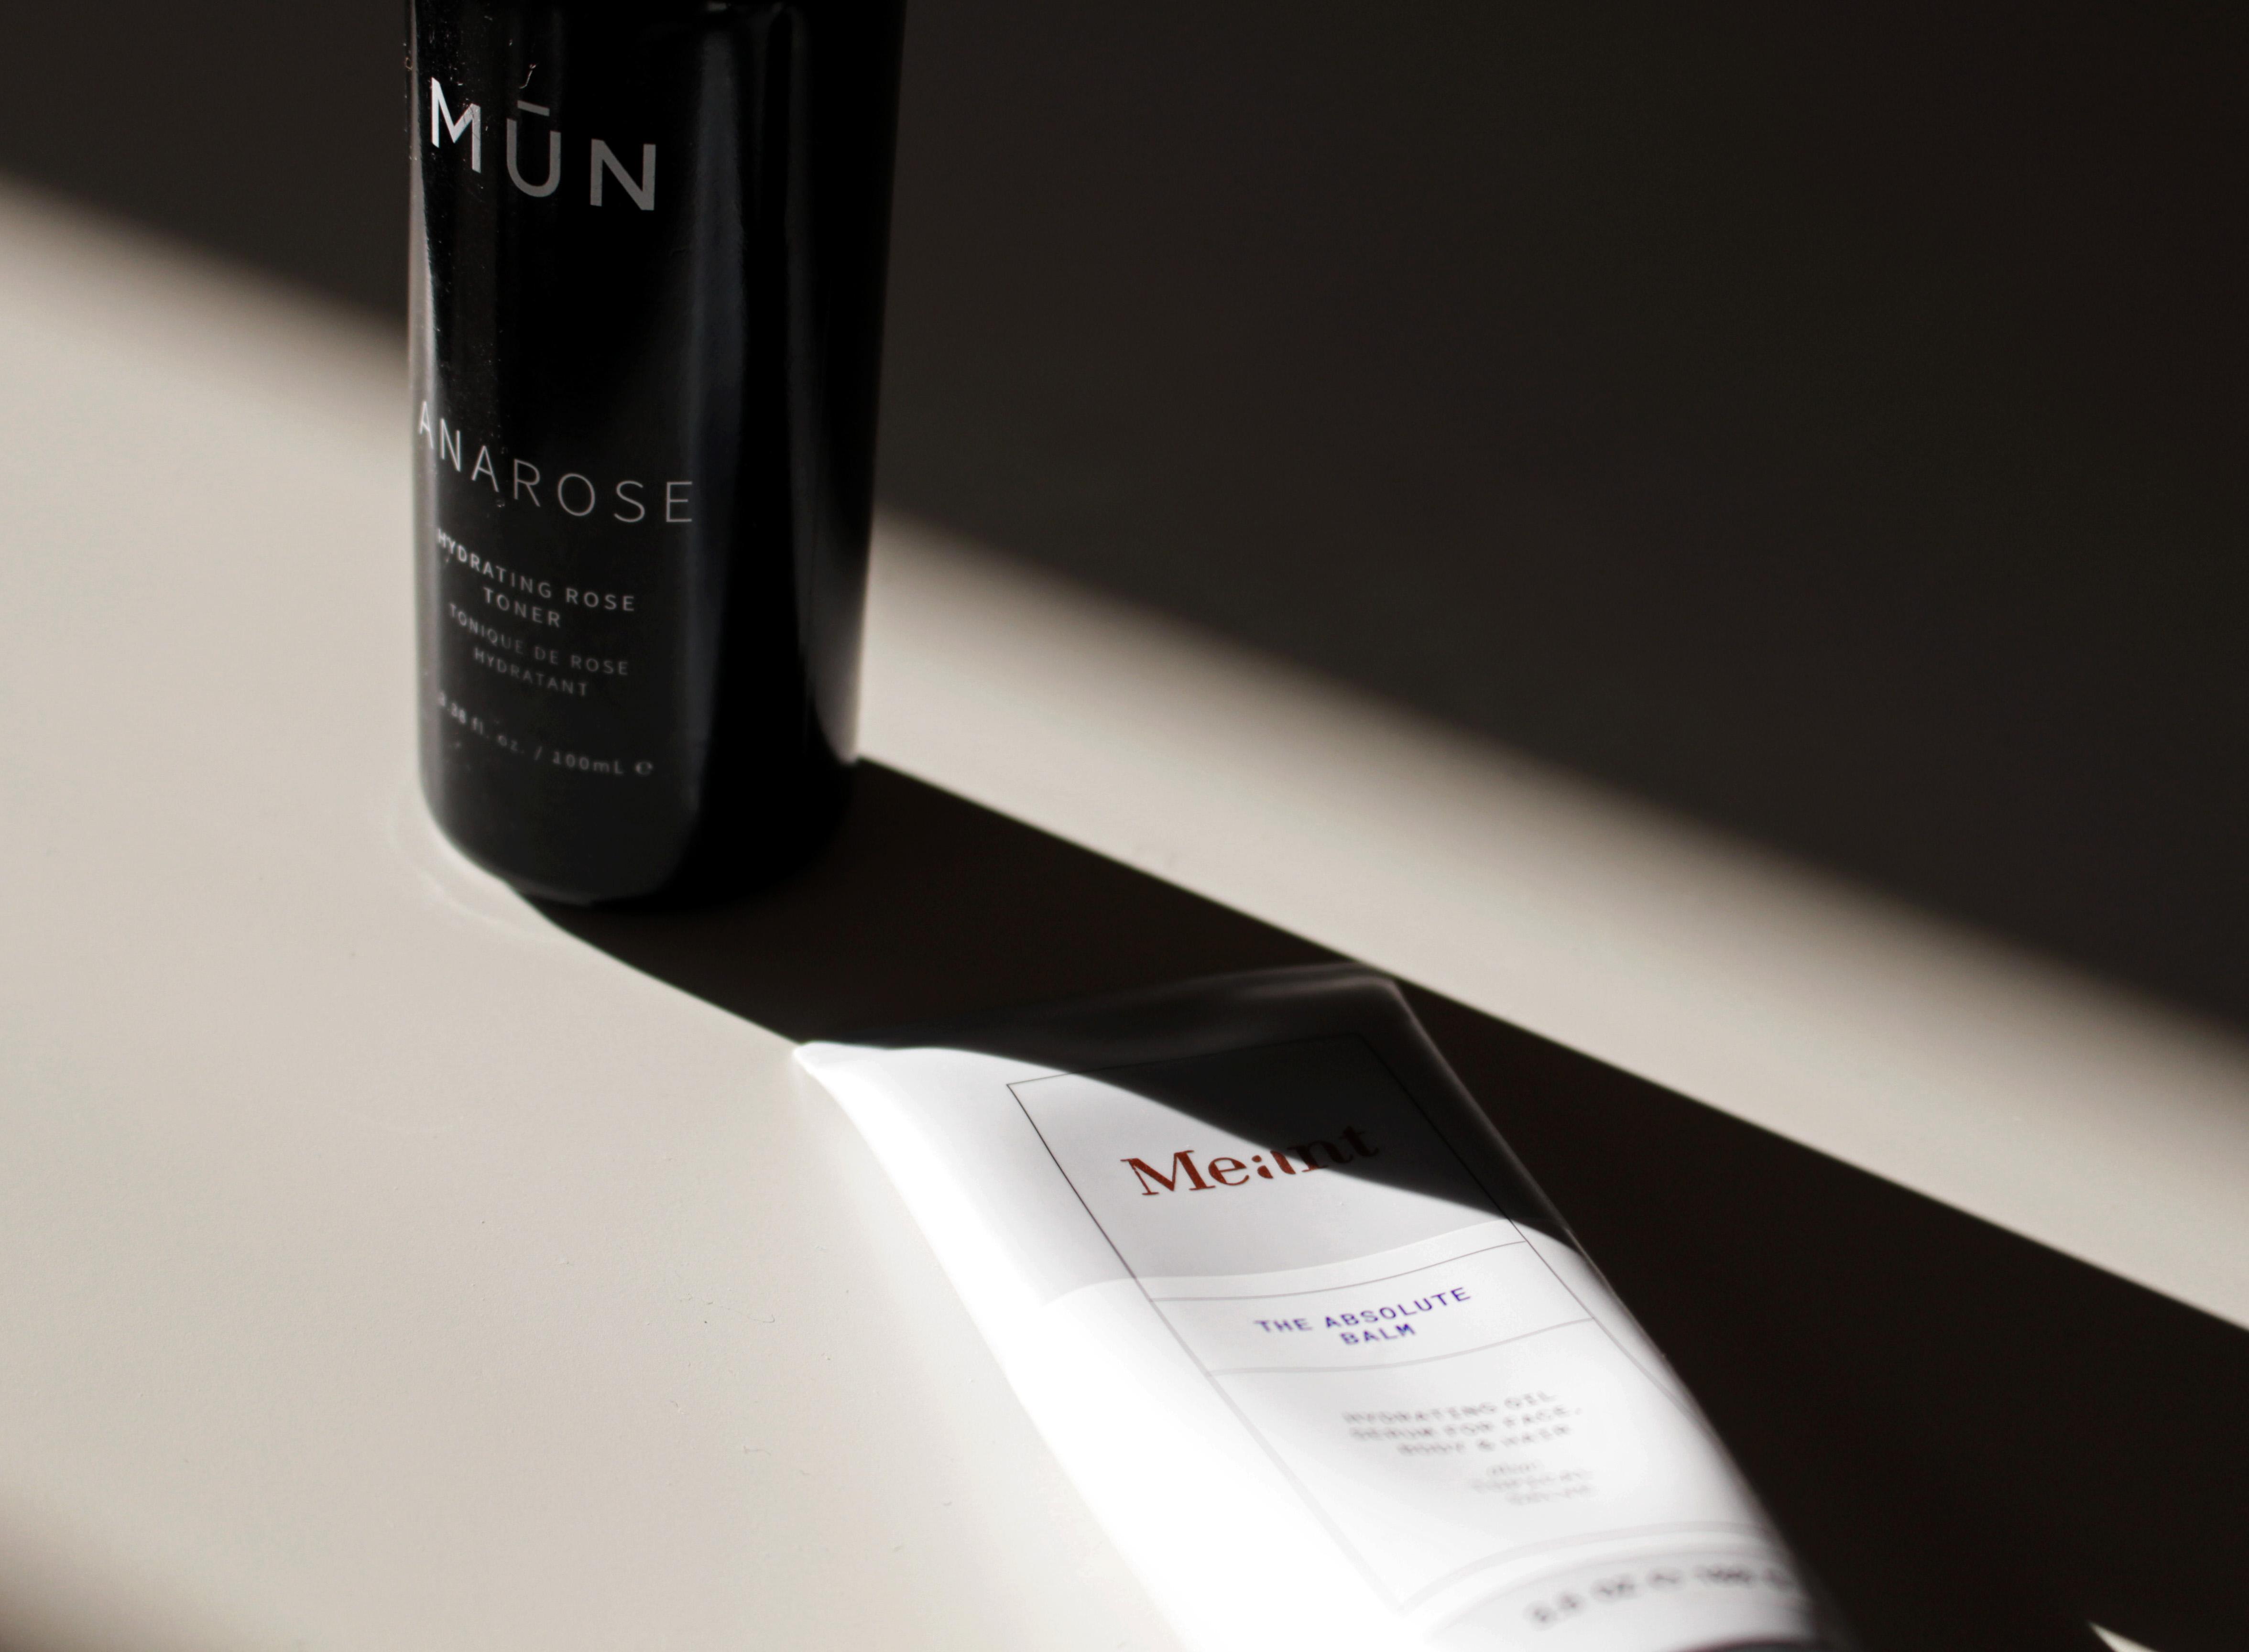 Best 6 Green Beauty Brands | Mun toner | The Beauty Vanity